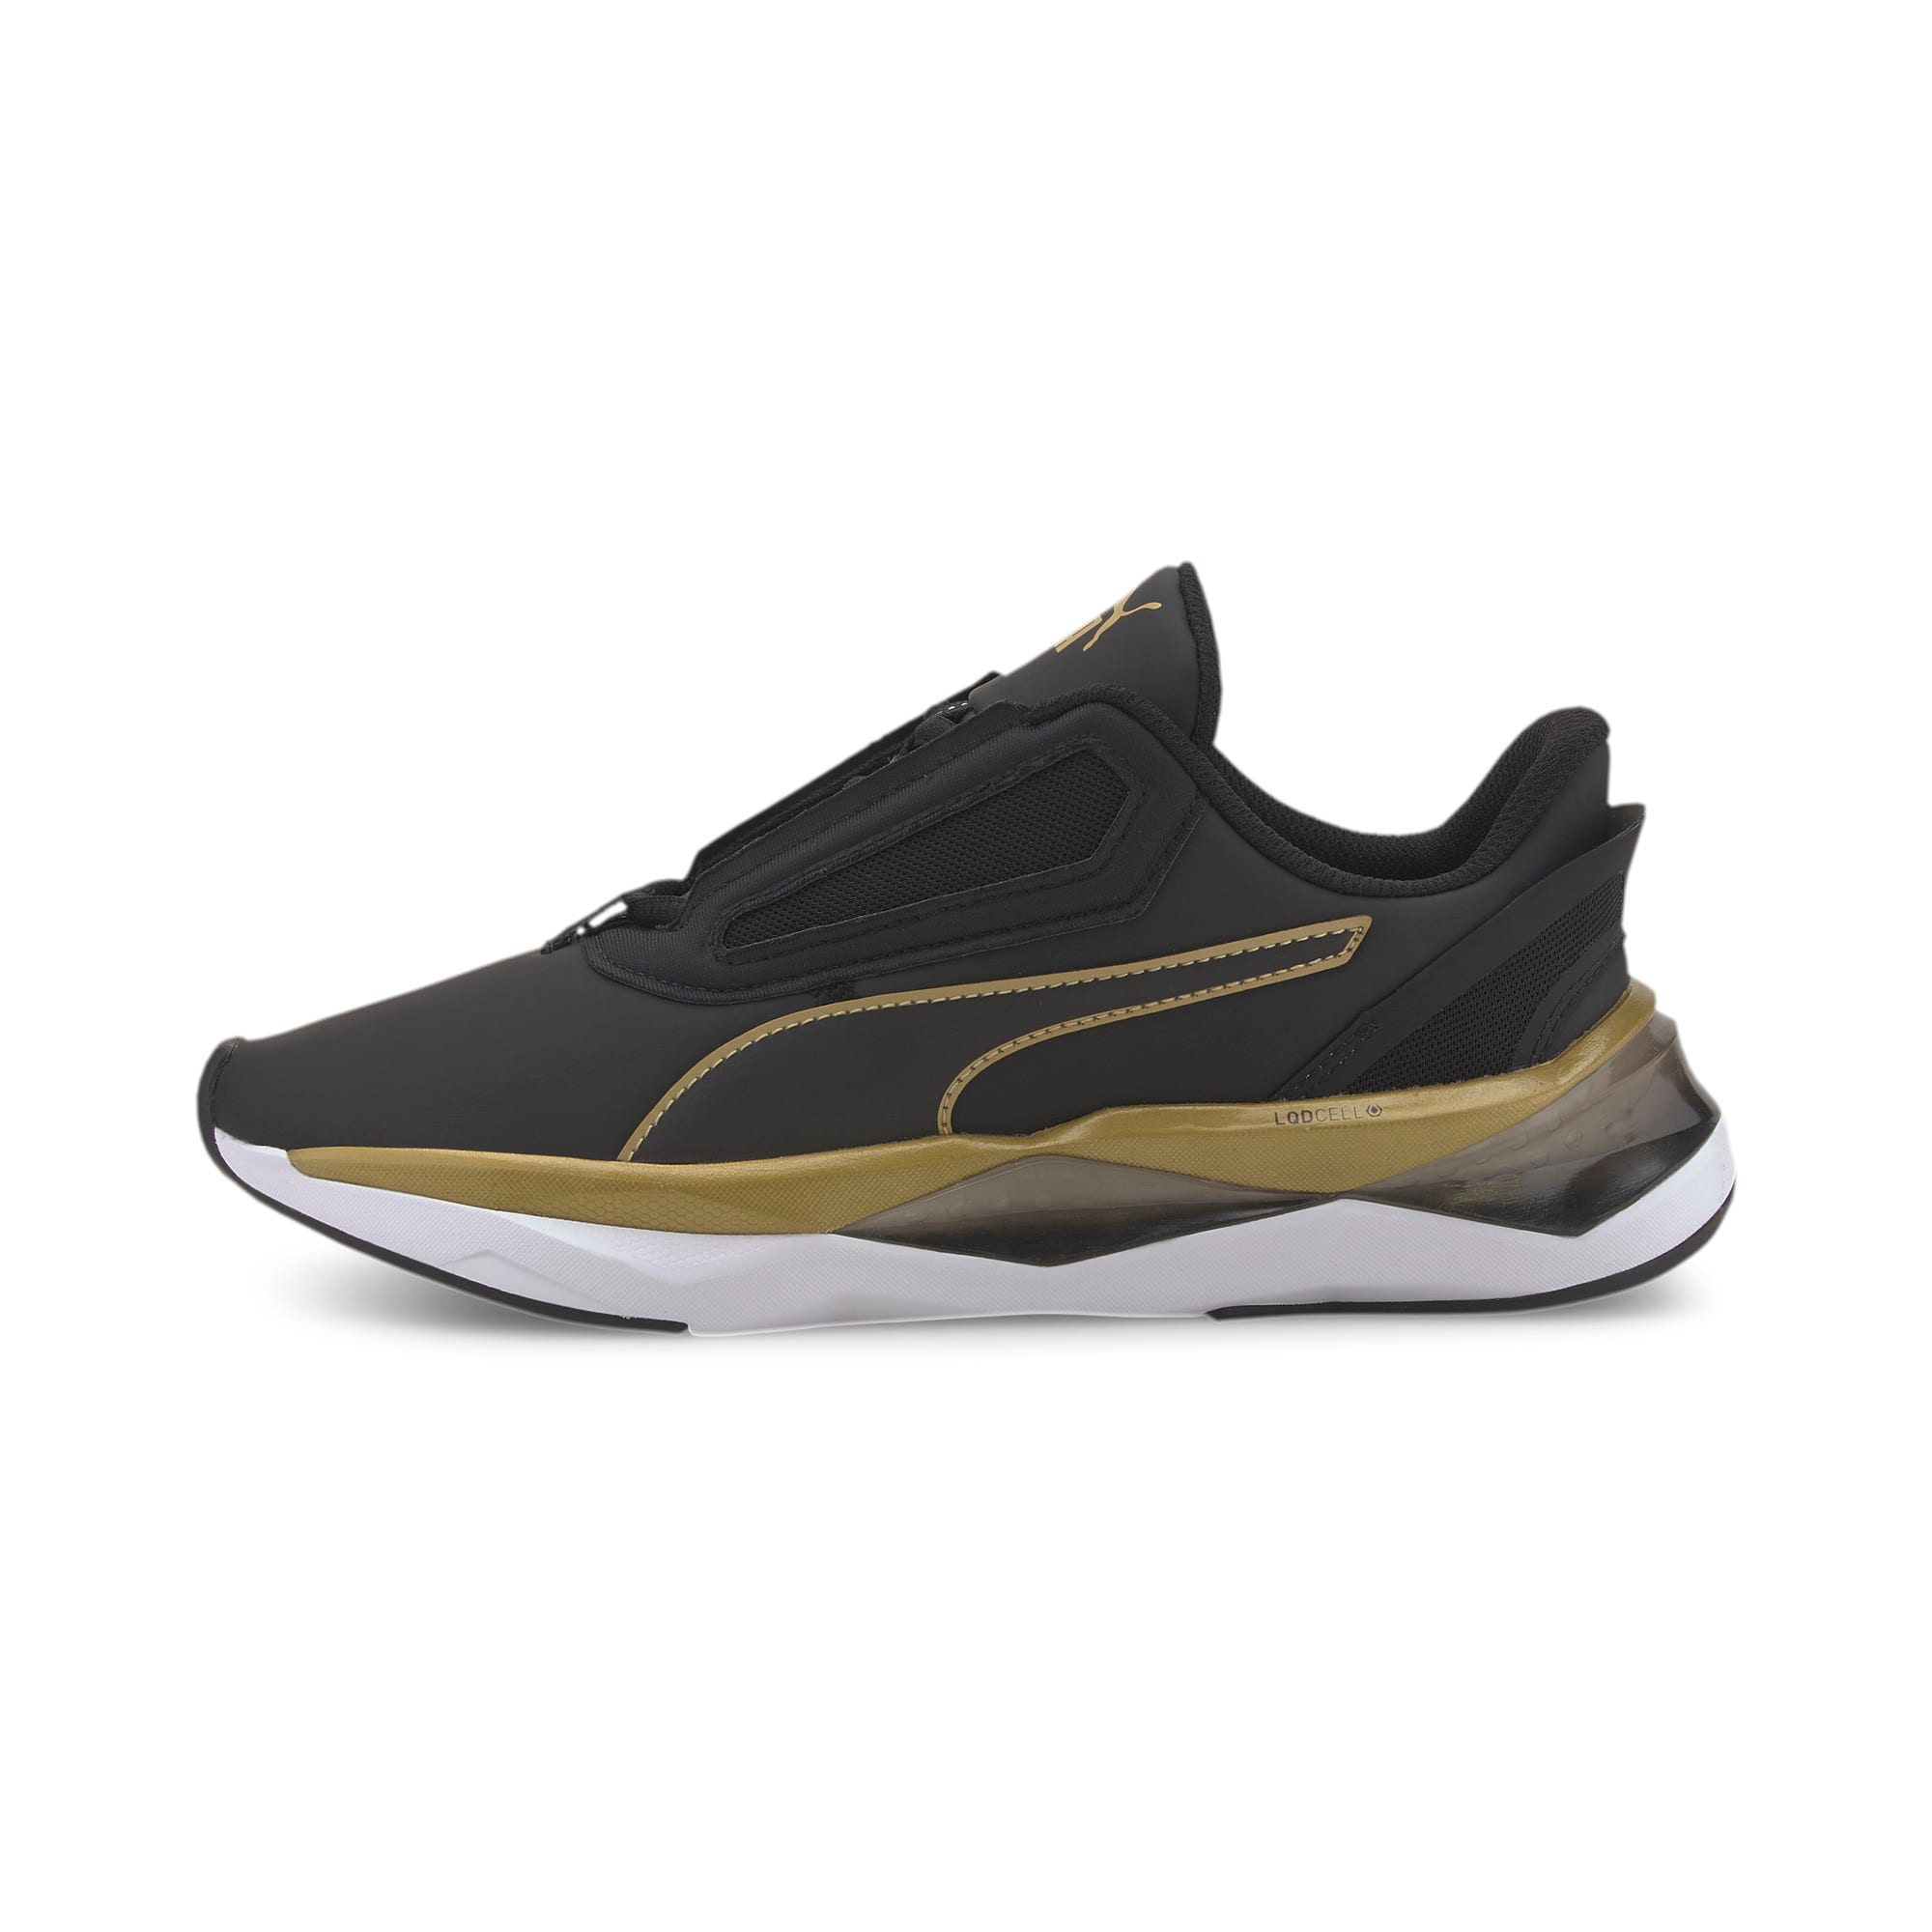 Thumbnail 1 of LQDCELL Shatter XT Matte Women's Training Shoes, Puma Black-Puma Team Gold, medium